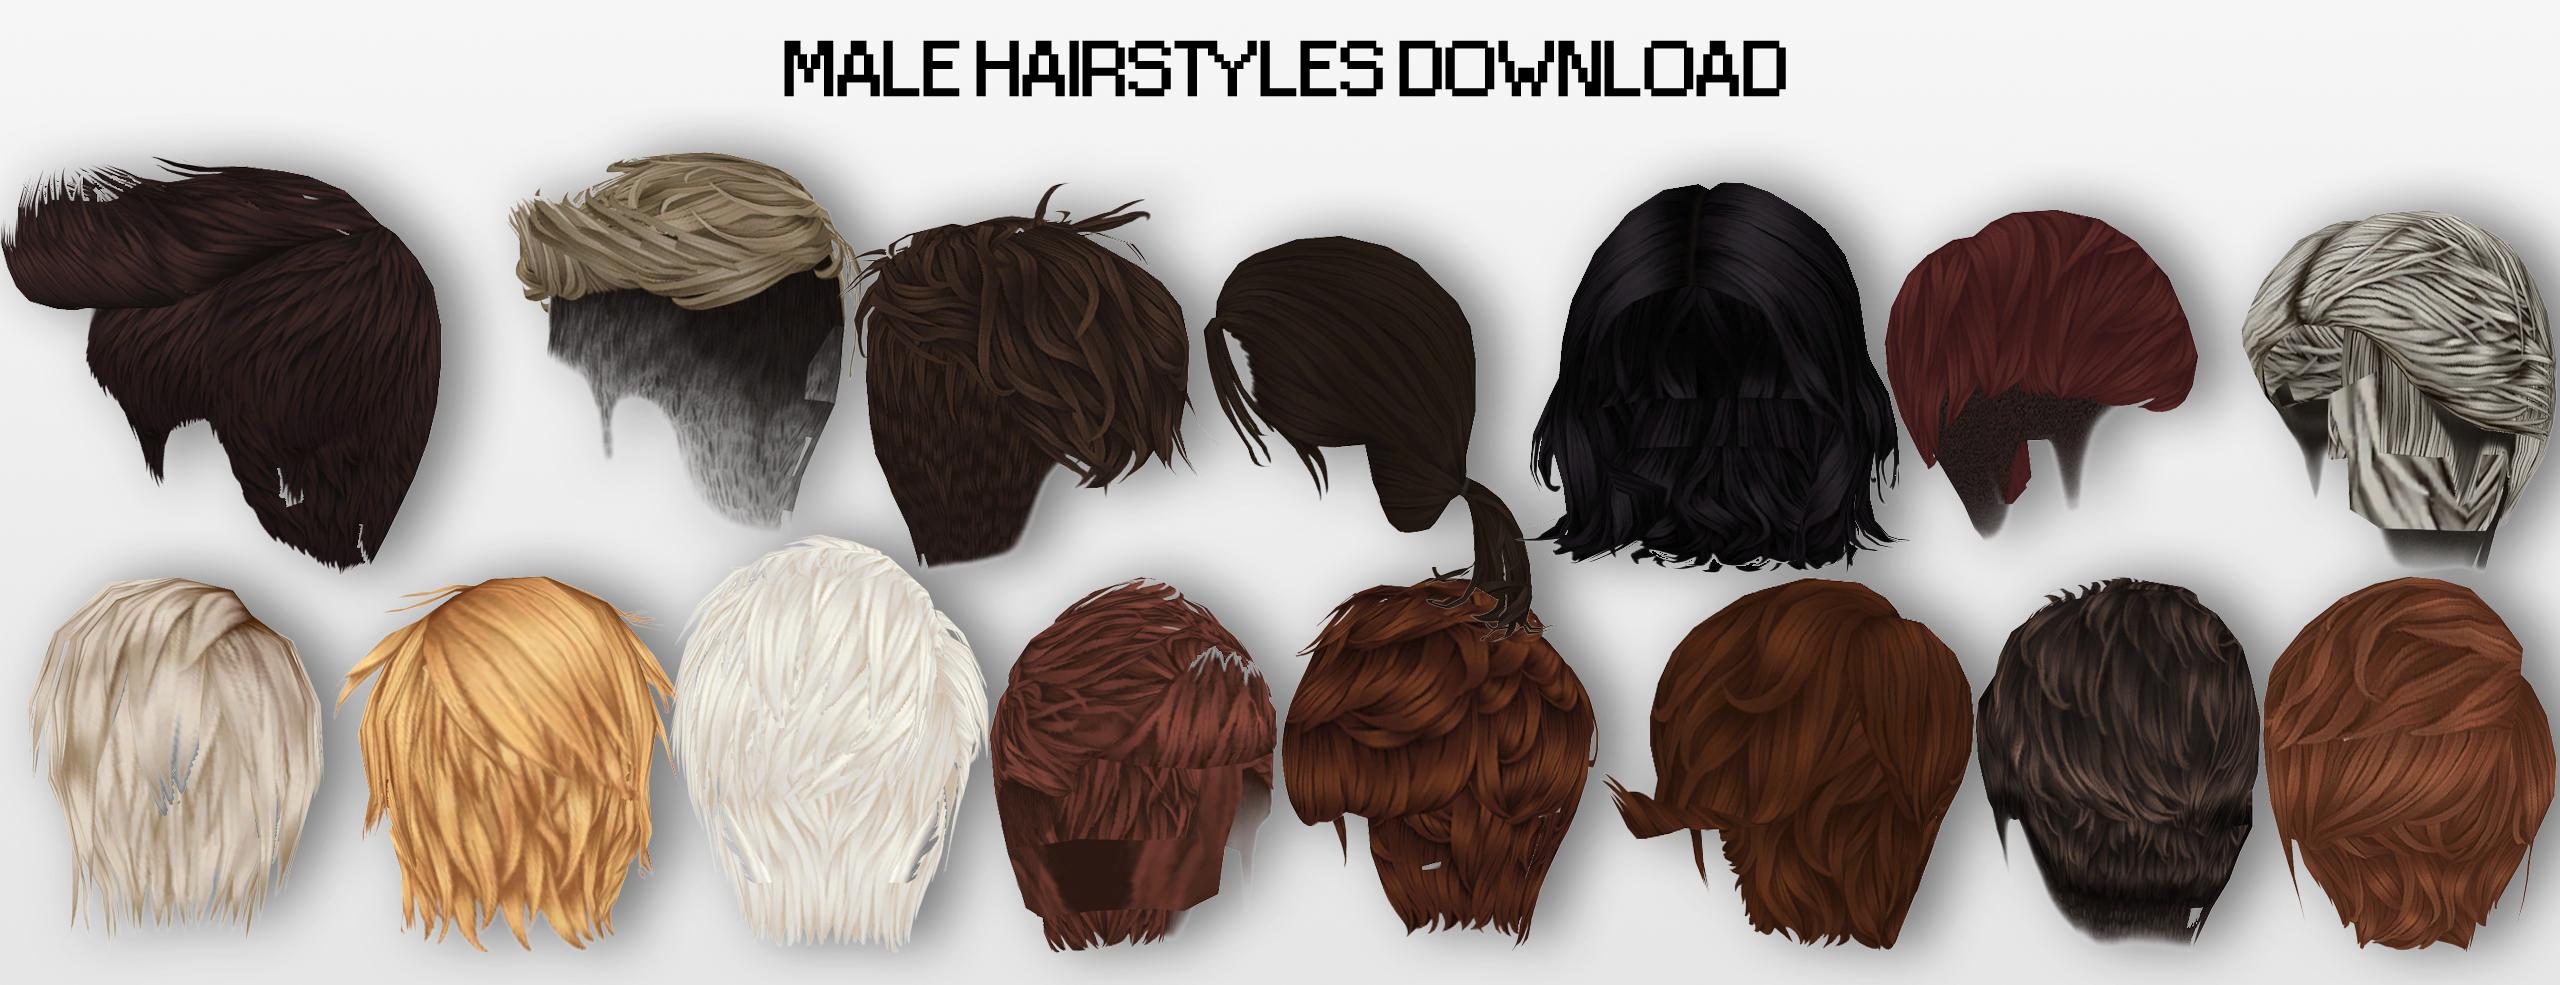 Mmd Male Hairstyles Dl By Unluckycandyfox On Deviantart